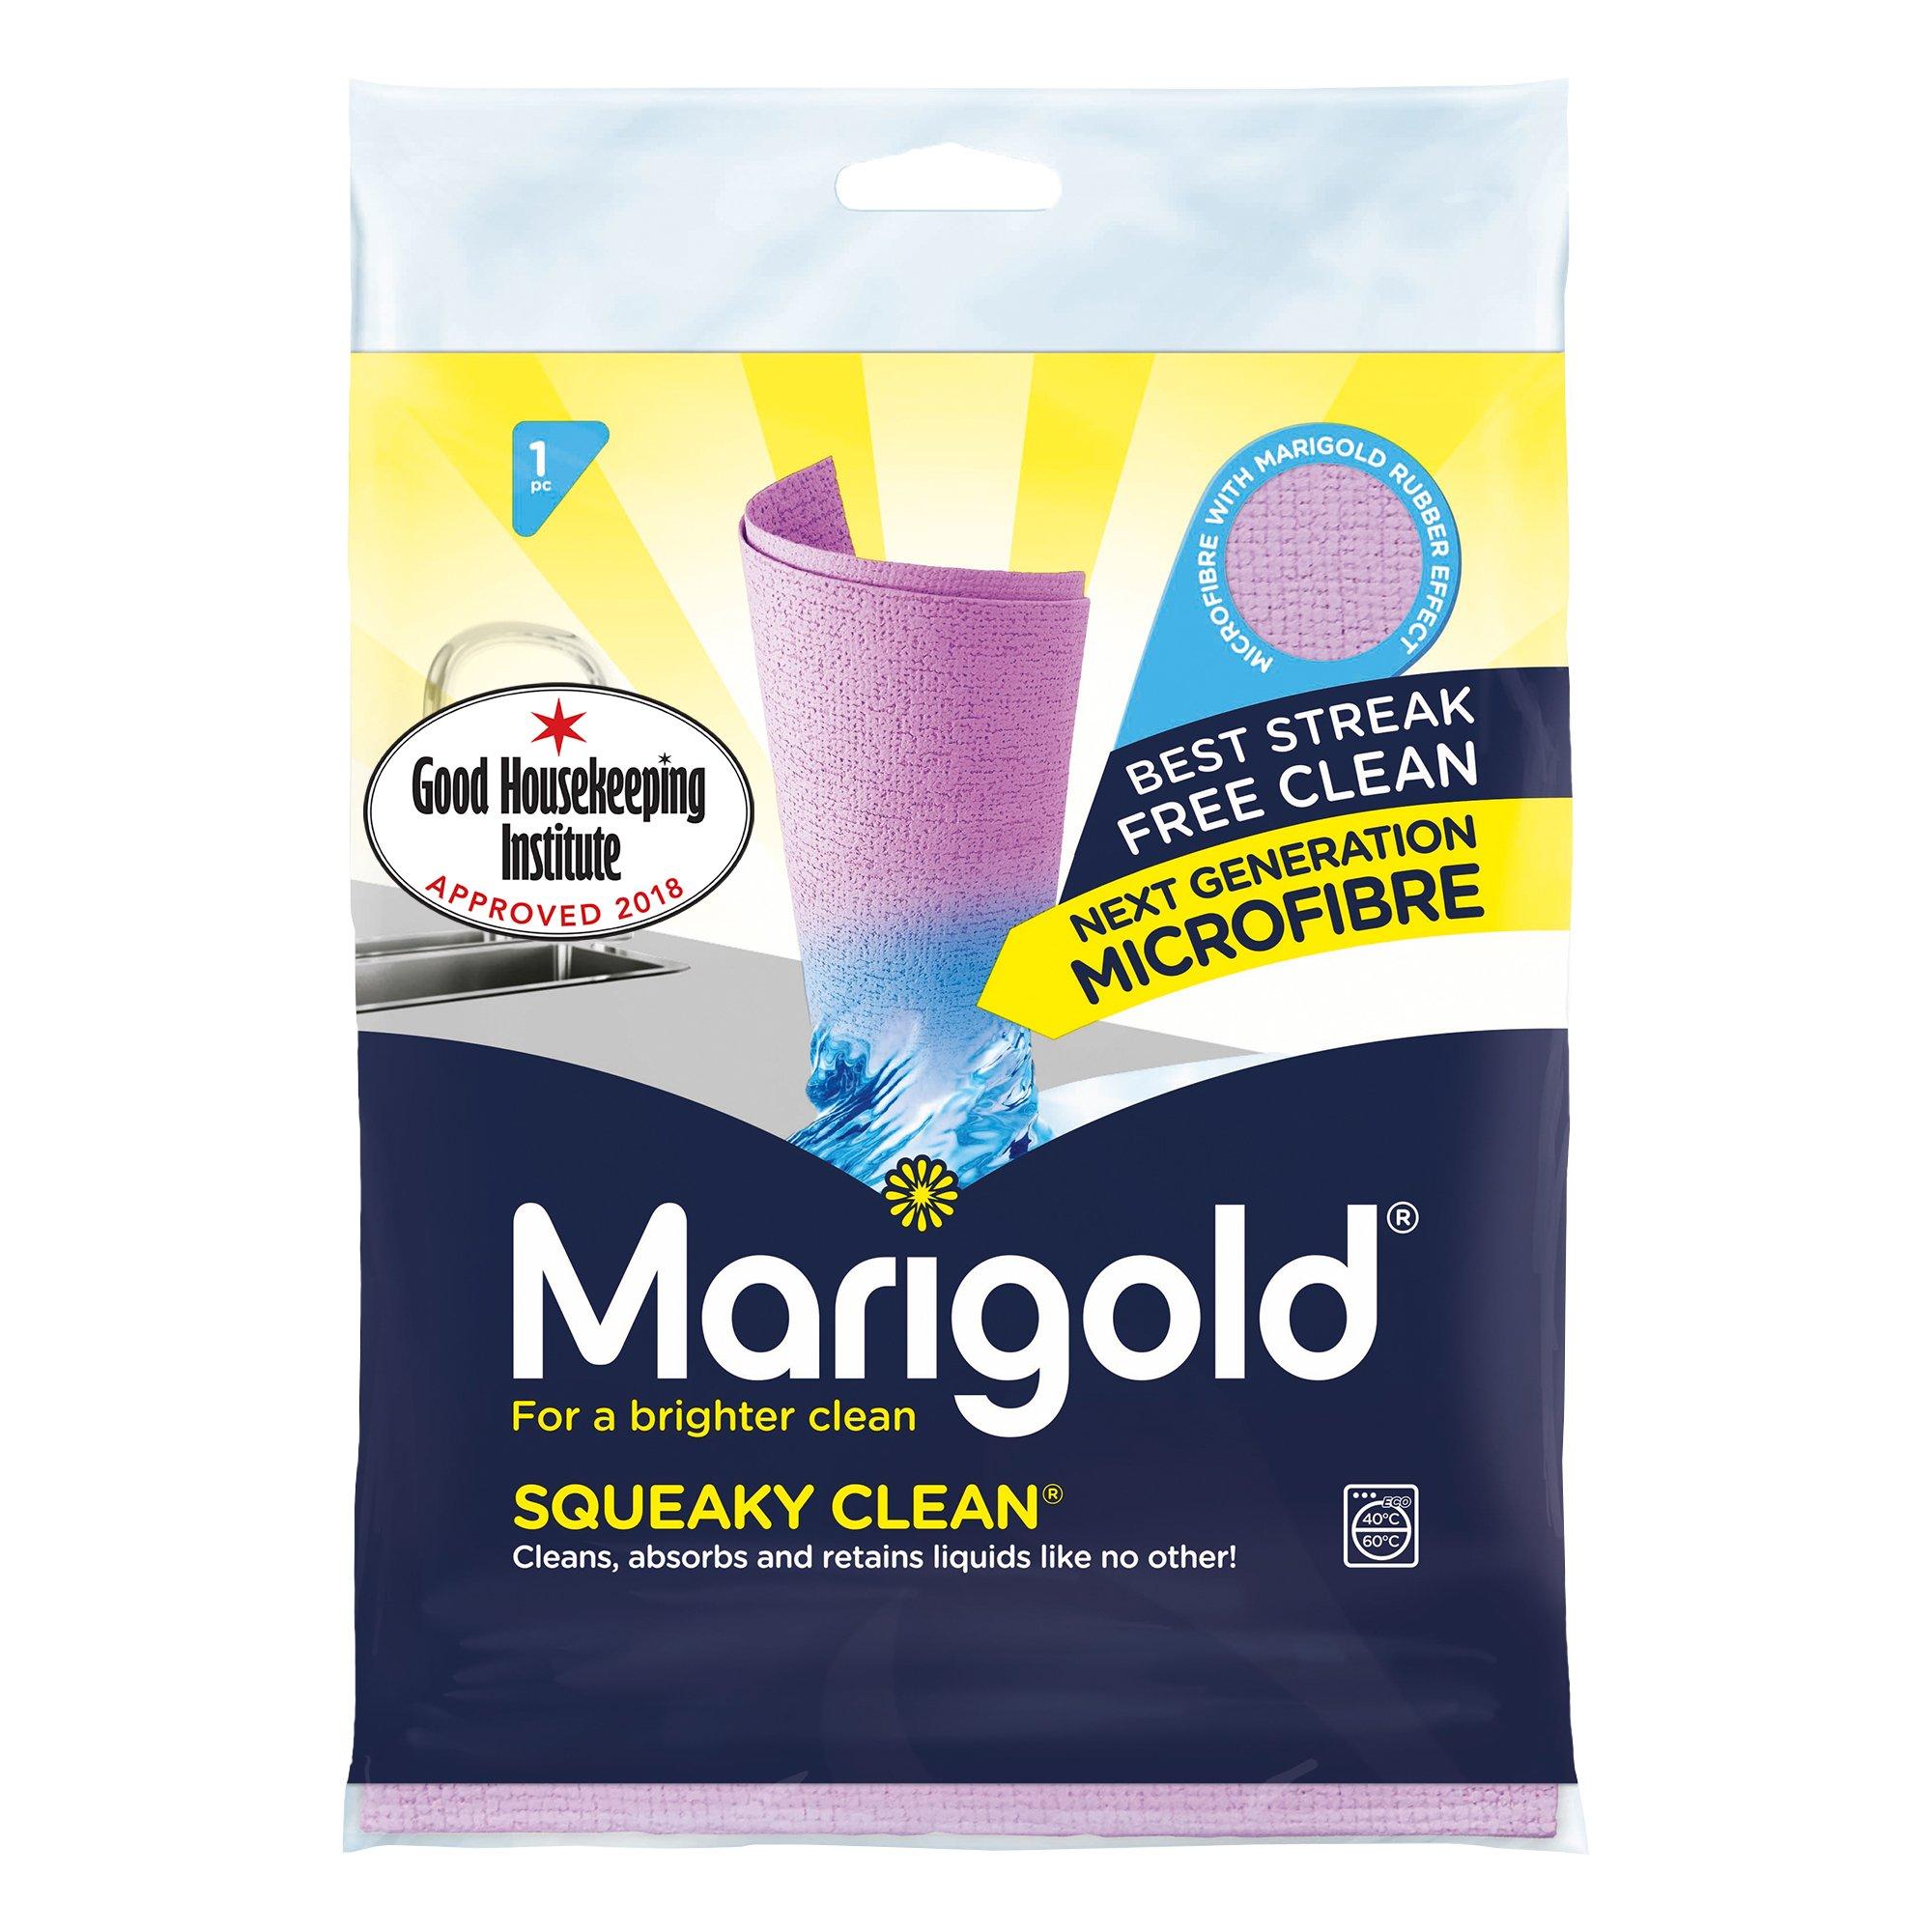 Marigold Squeaky Clean Microfibre Streak Free Cloth, 25 Single Packs